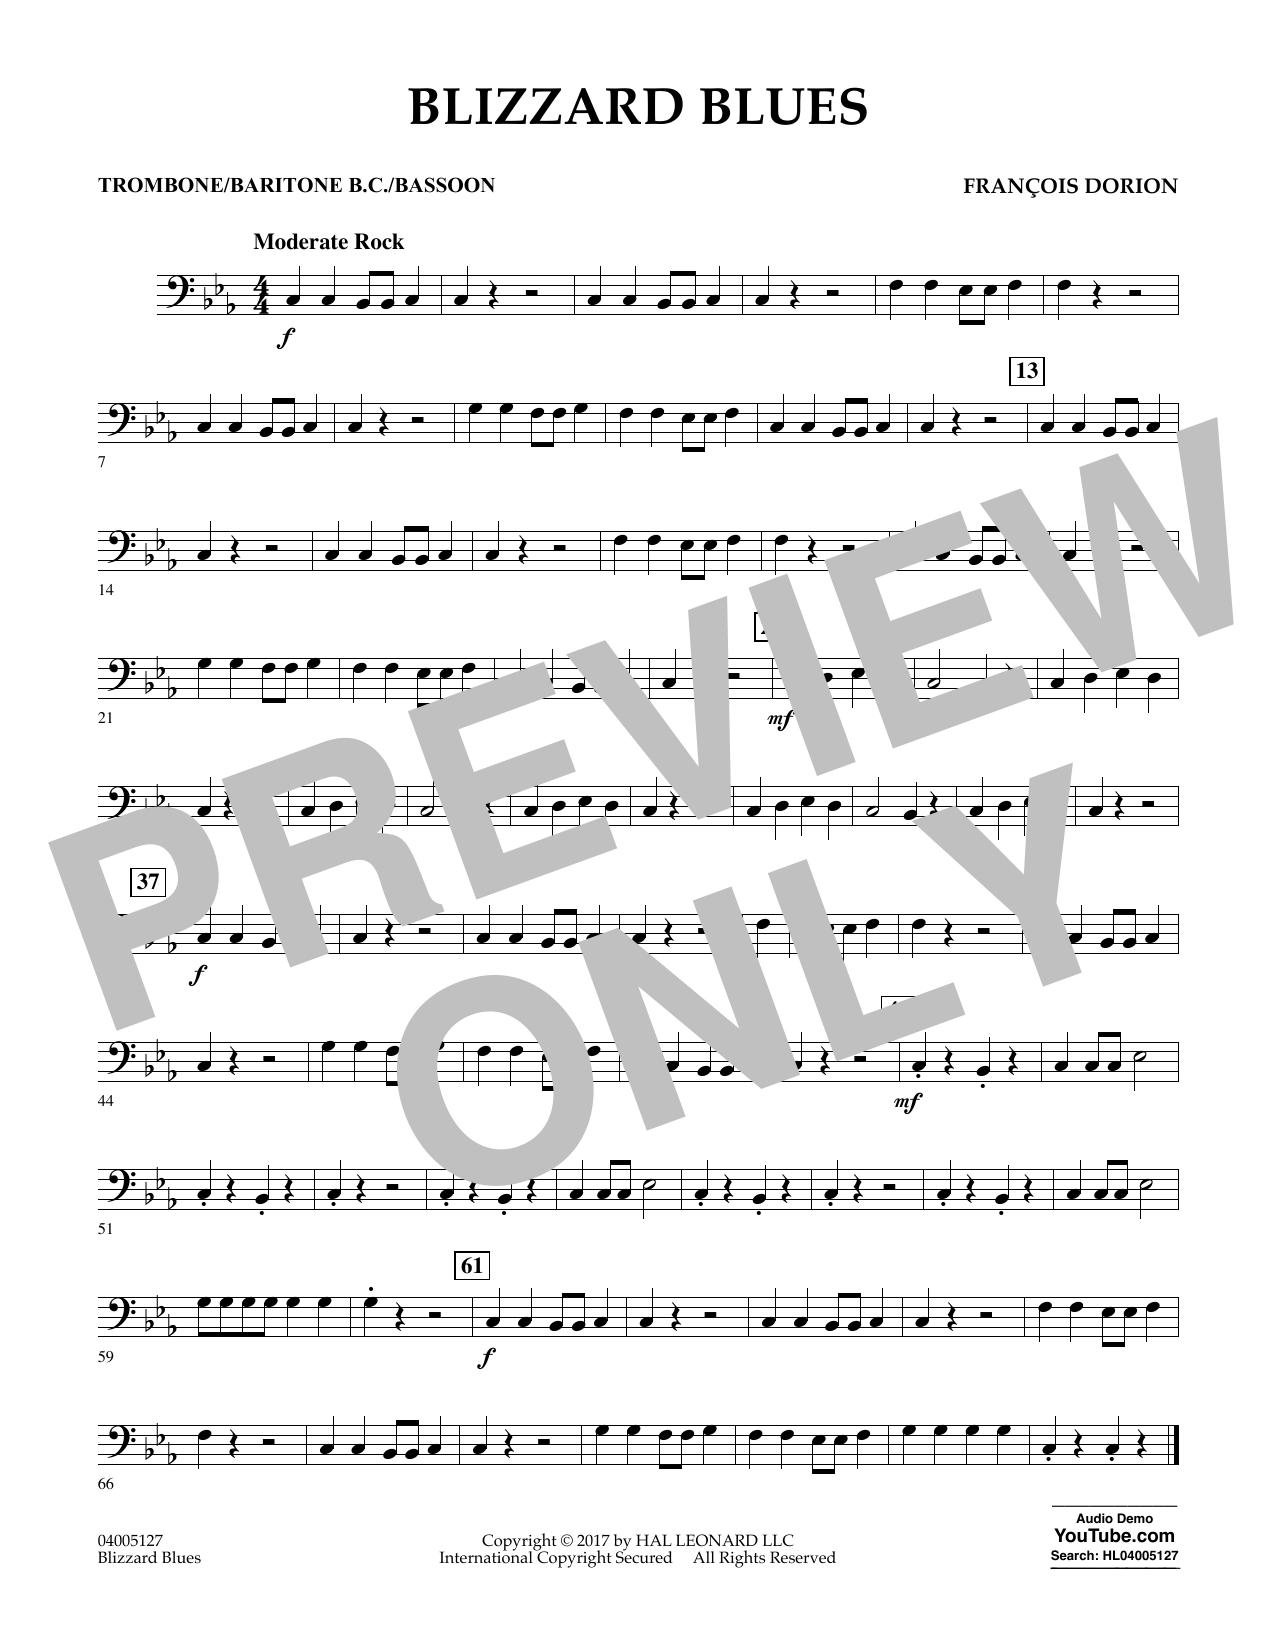 Blizzard Blues - Trombone/Baritone B.C./Bassoon Sheet Music